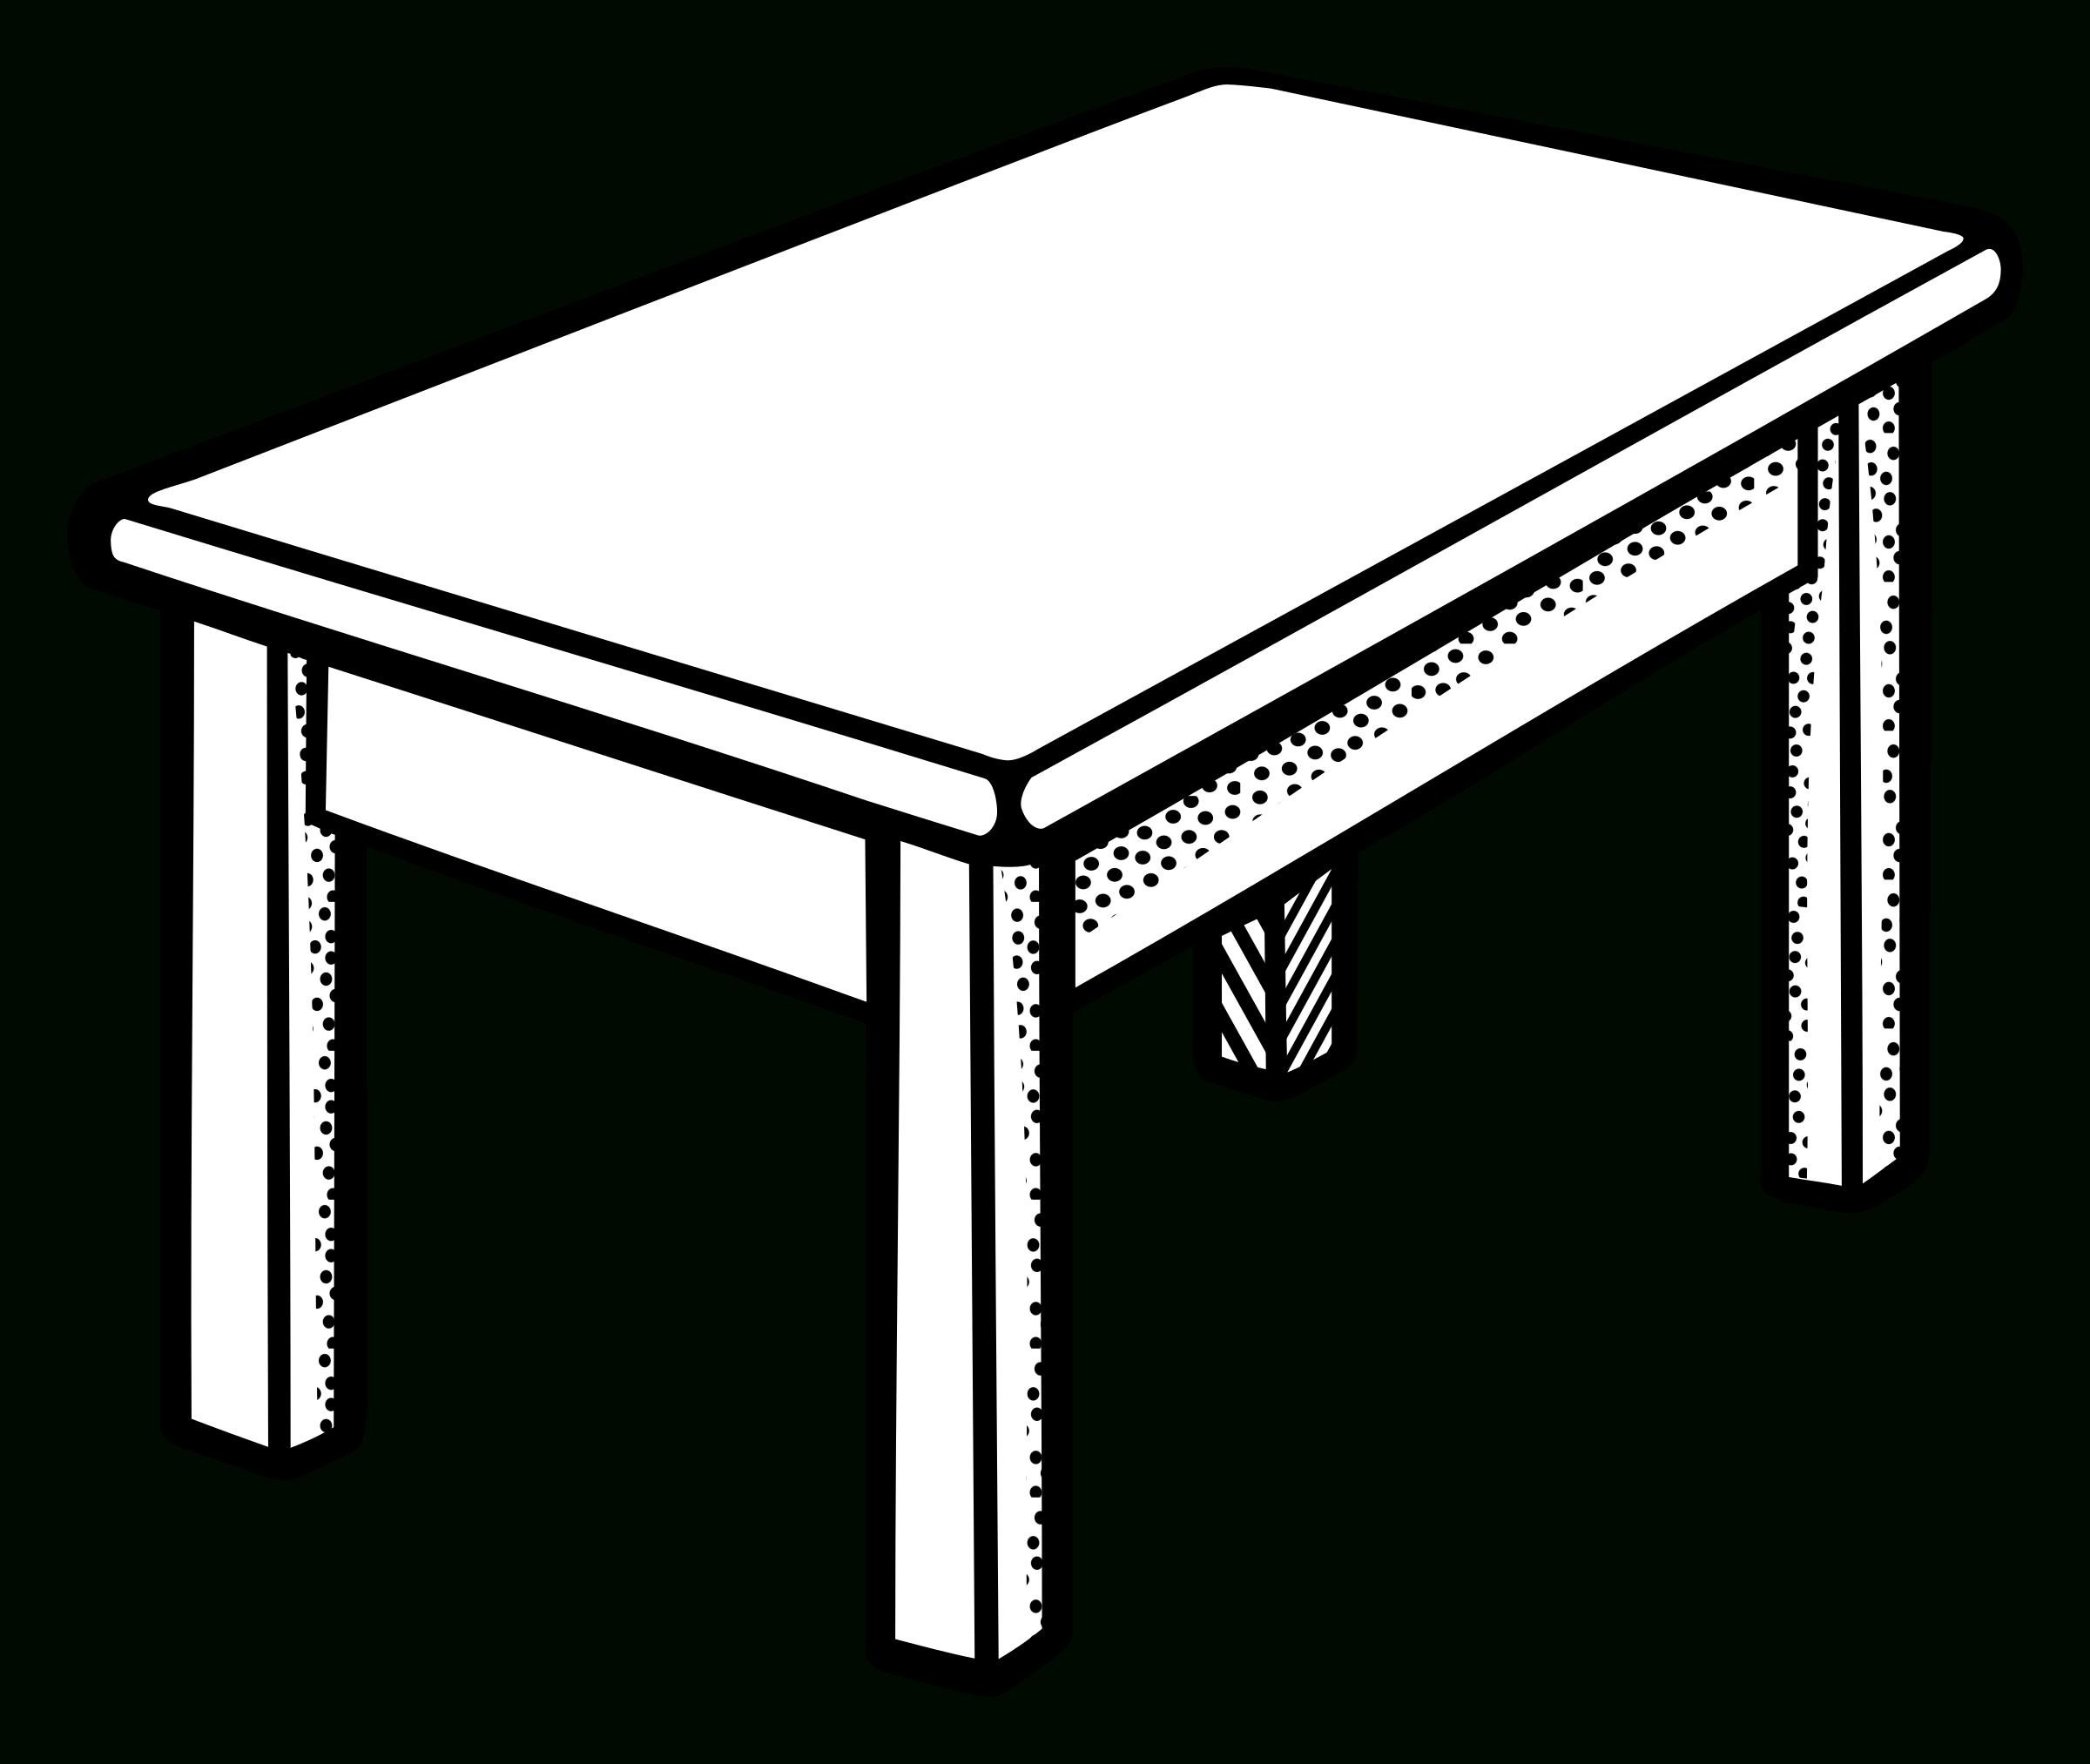 Desk clipart desk drawer. Pretty table illustration of